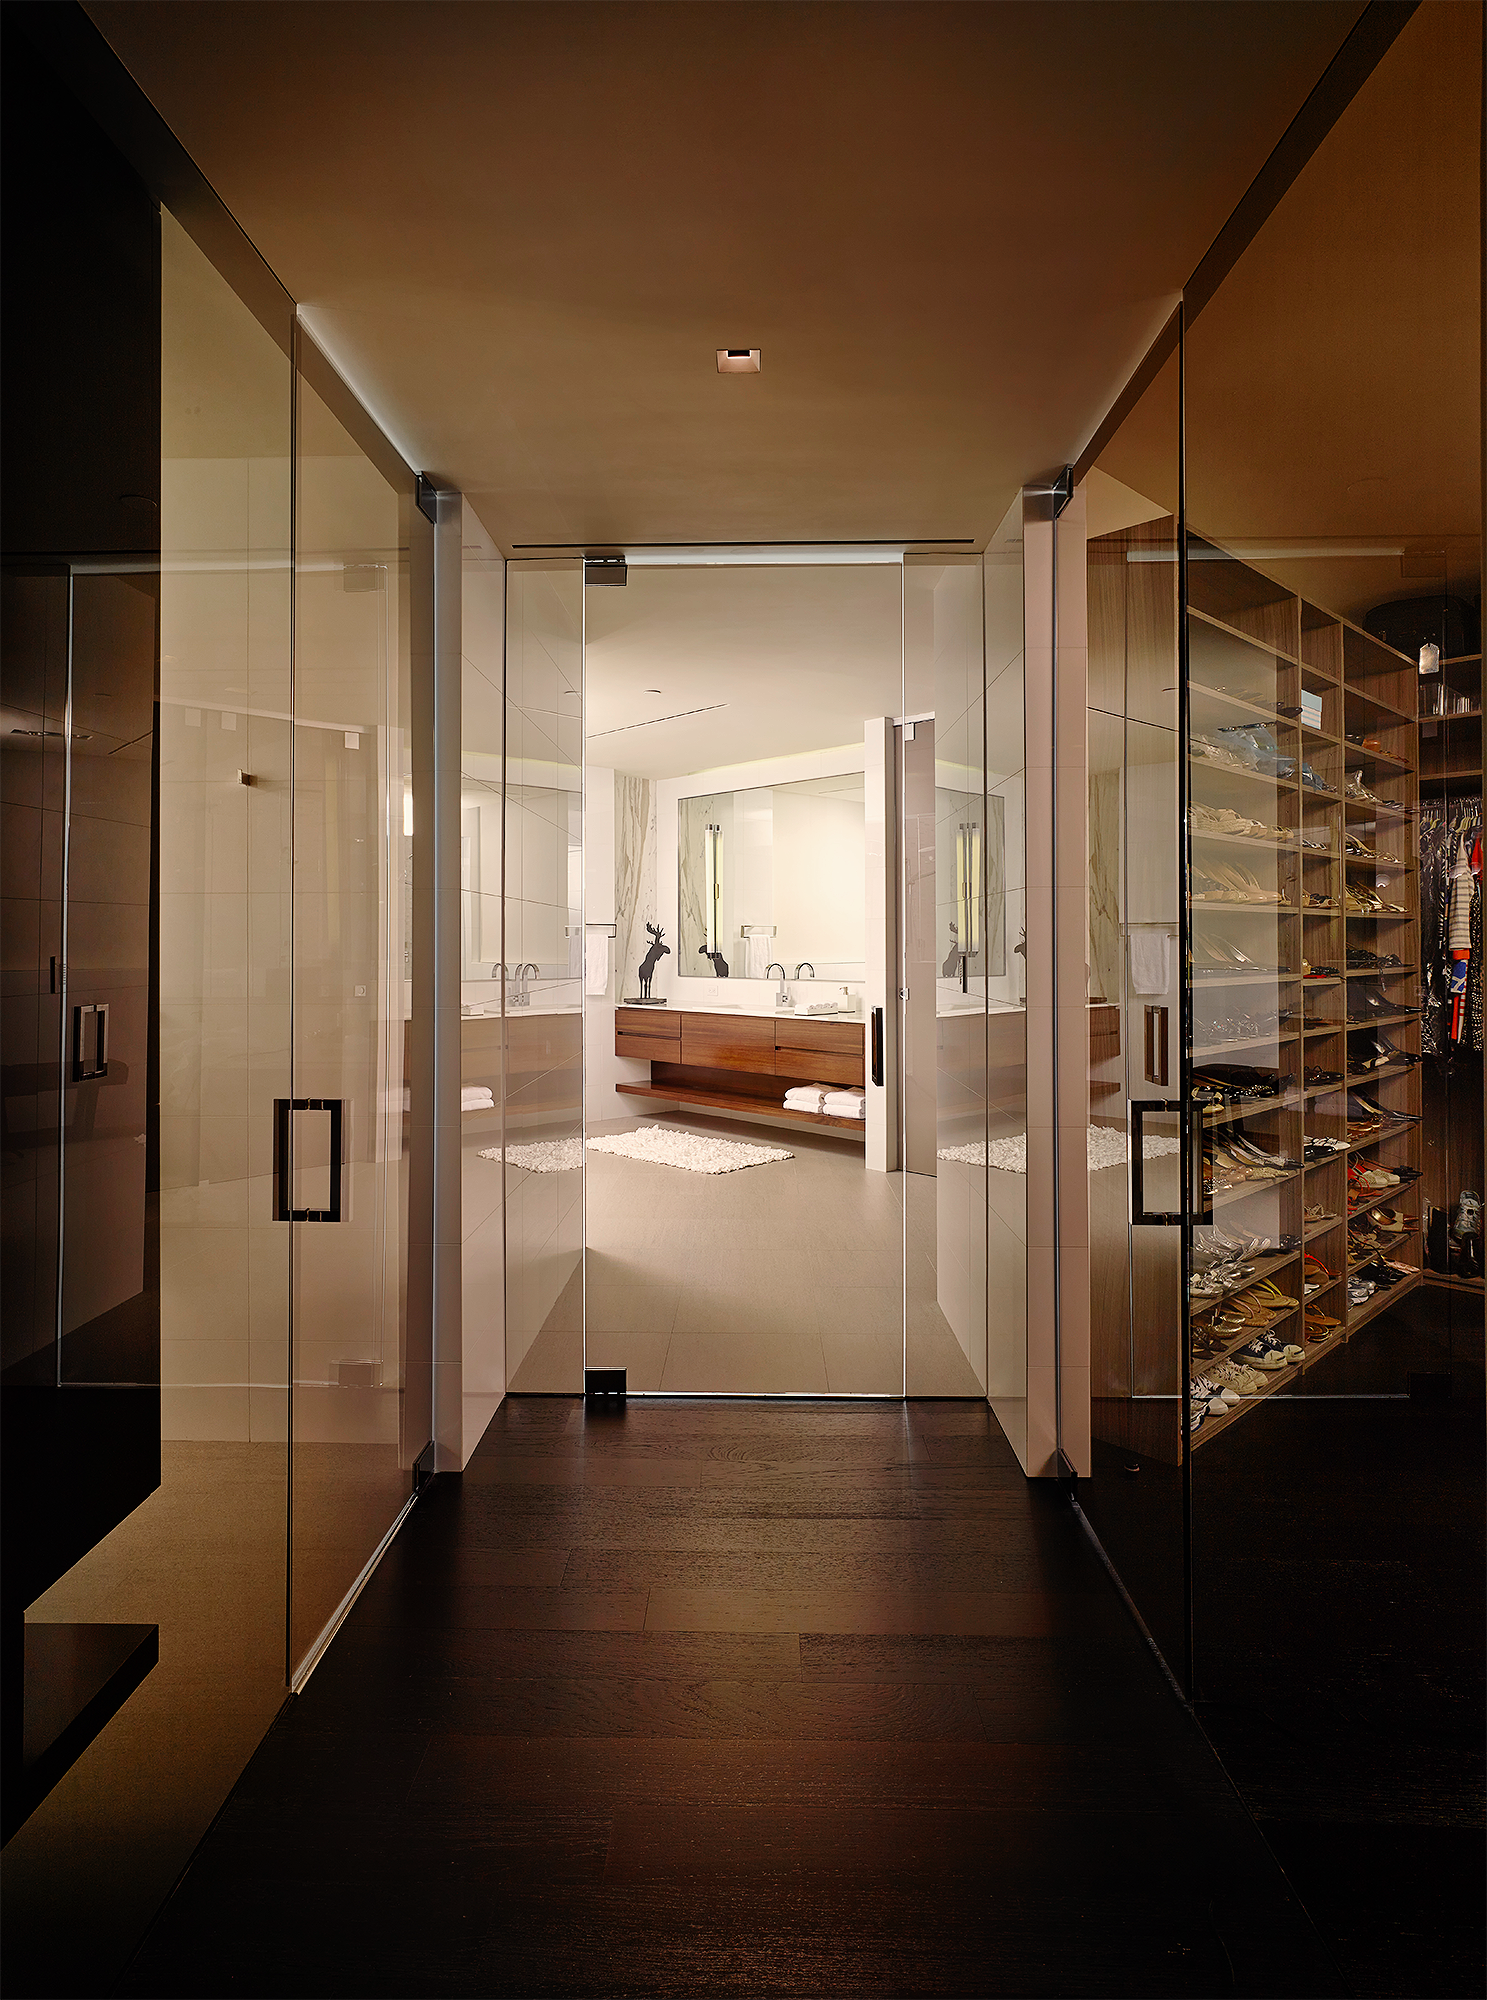 Porto Vita Residence, Fort Lauderdale Bathroom Hallway, Door Open bit.ly/1xi6Ulg + bit.ly/1u7mKxS #interiordesign